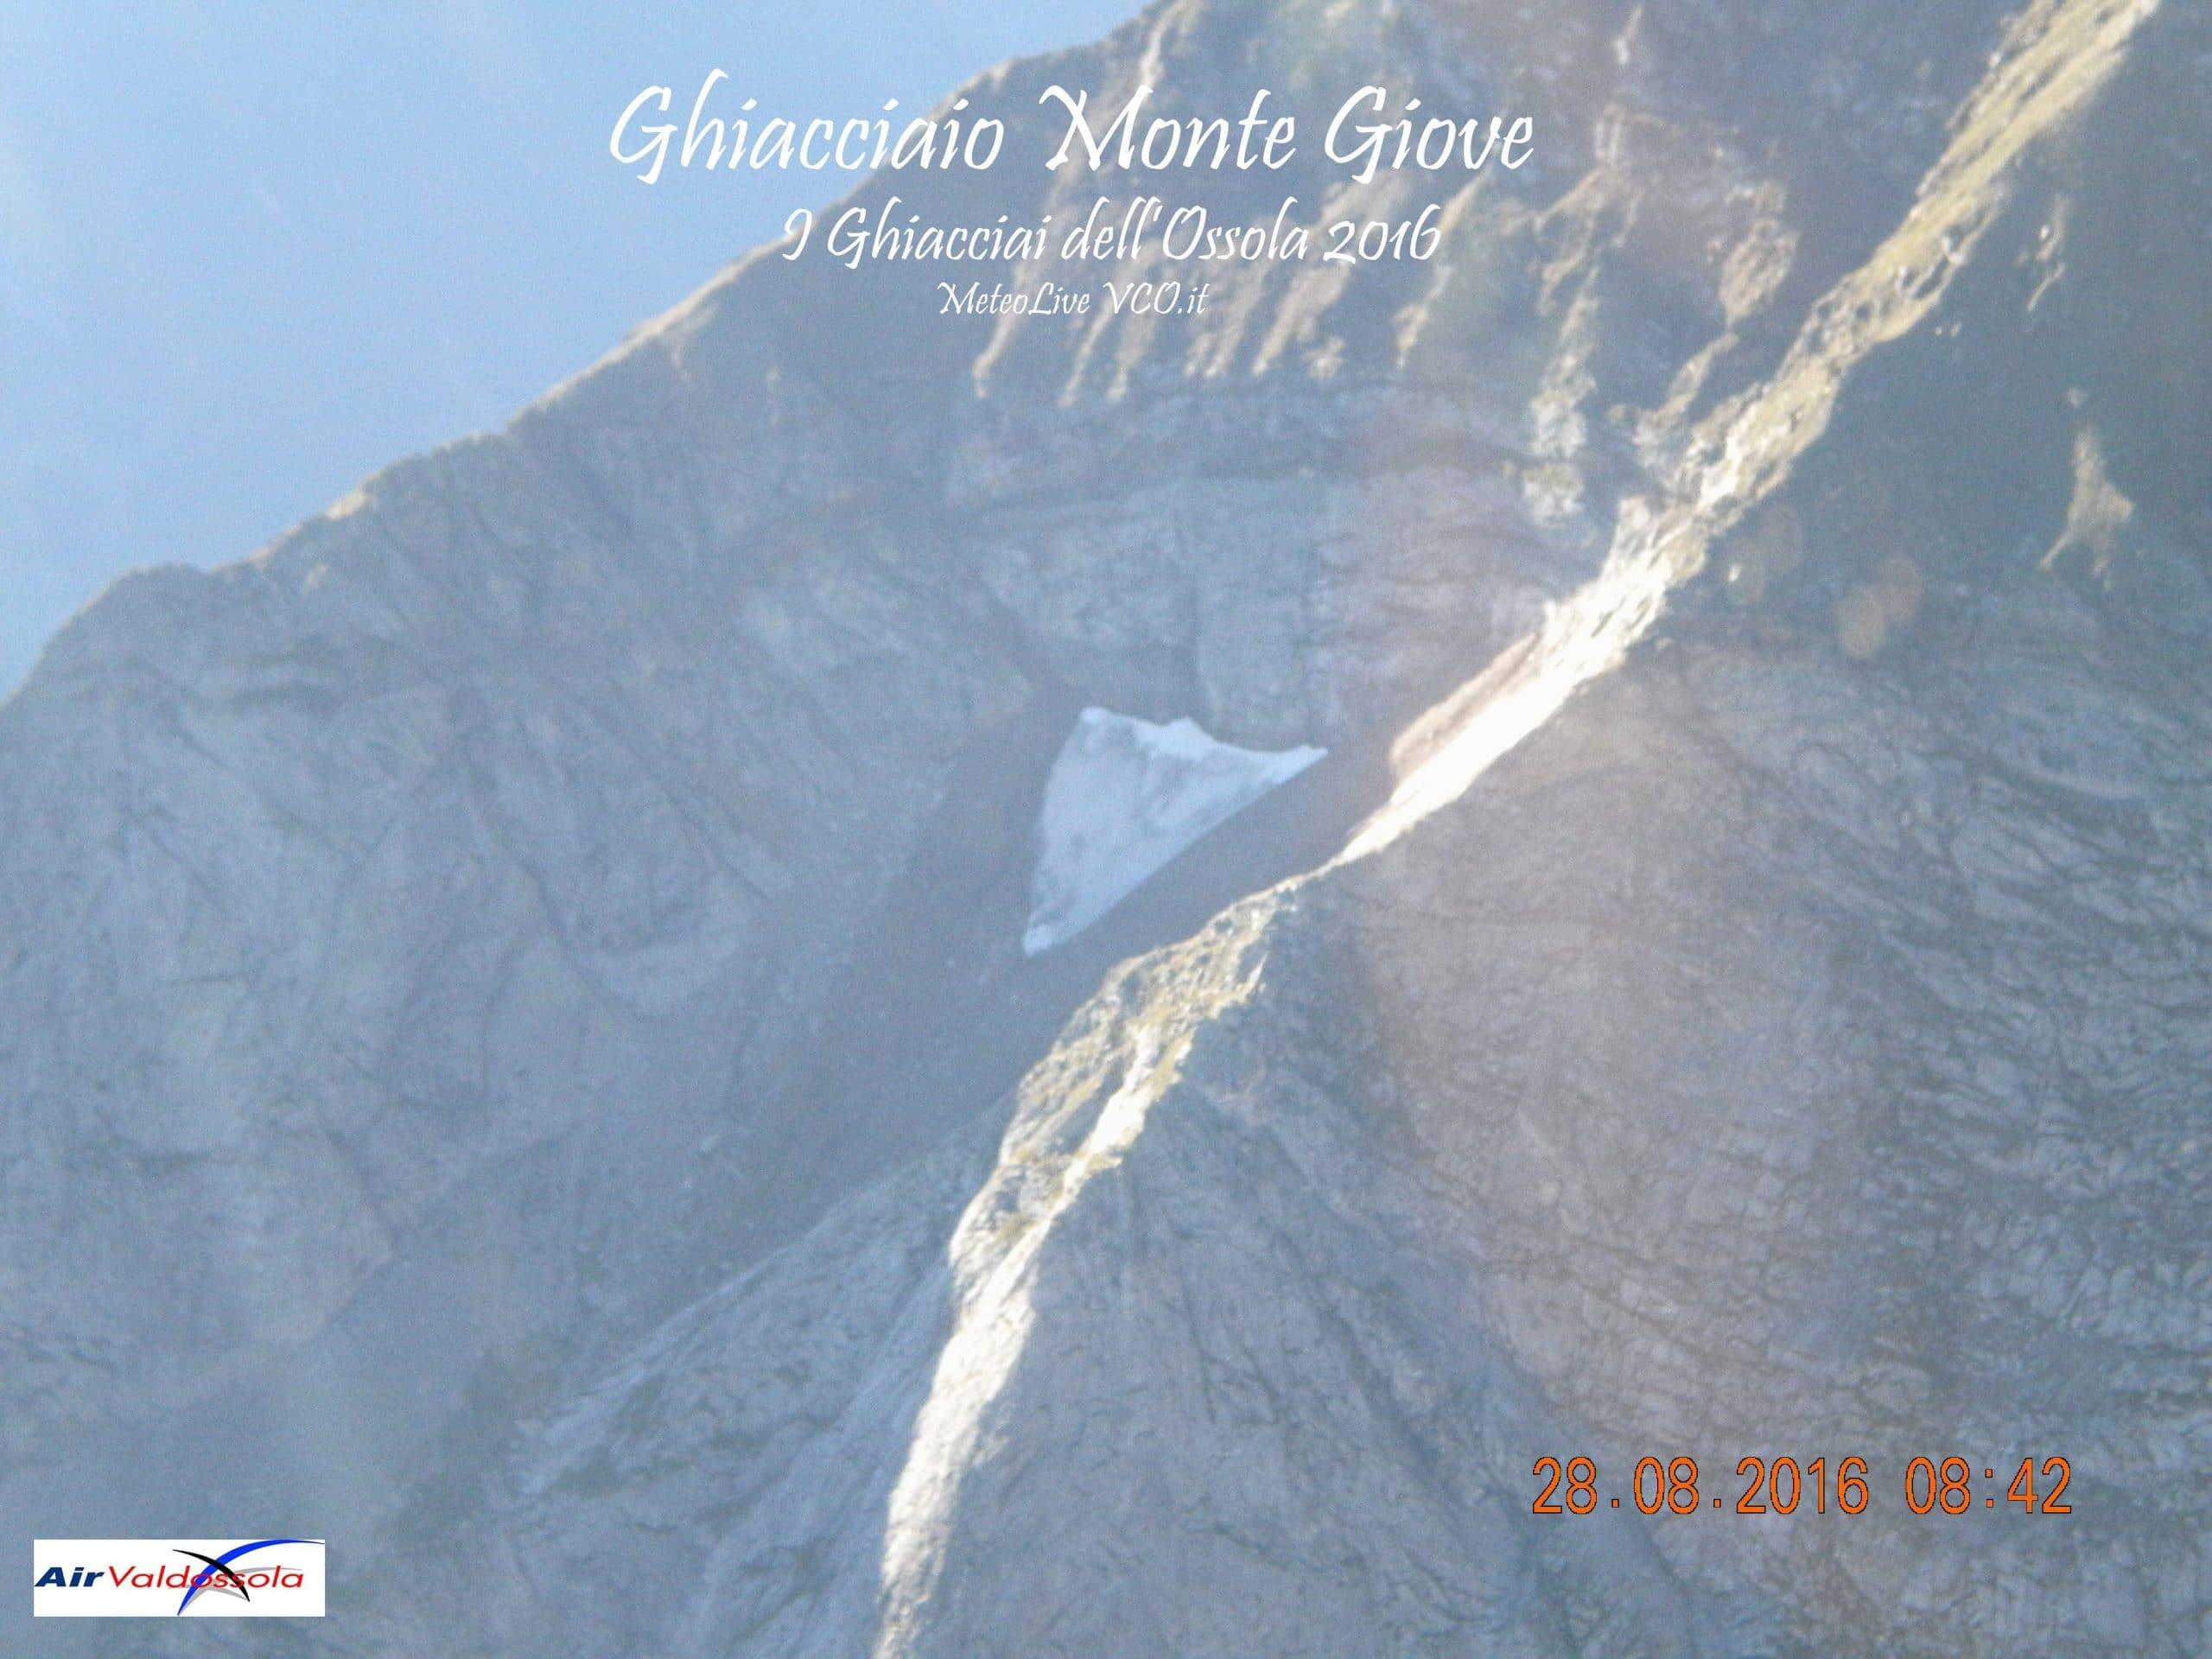 Ghiacciaio Monte Giove